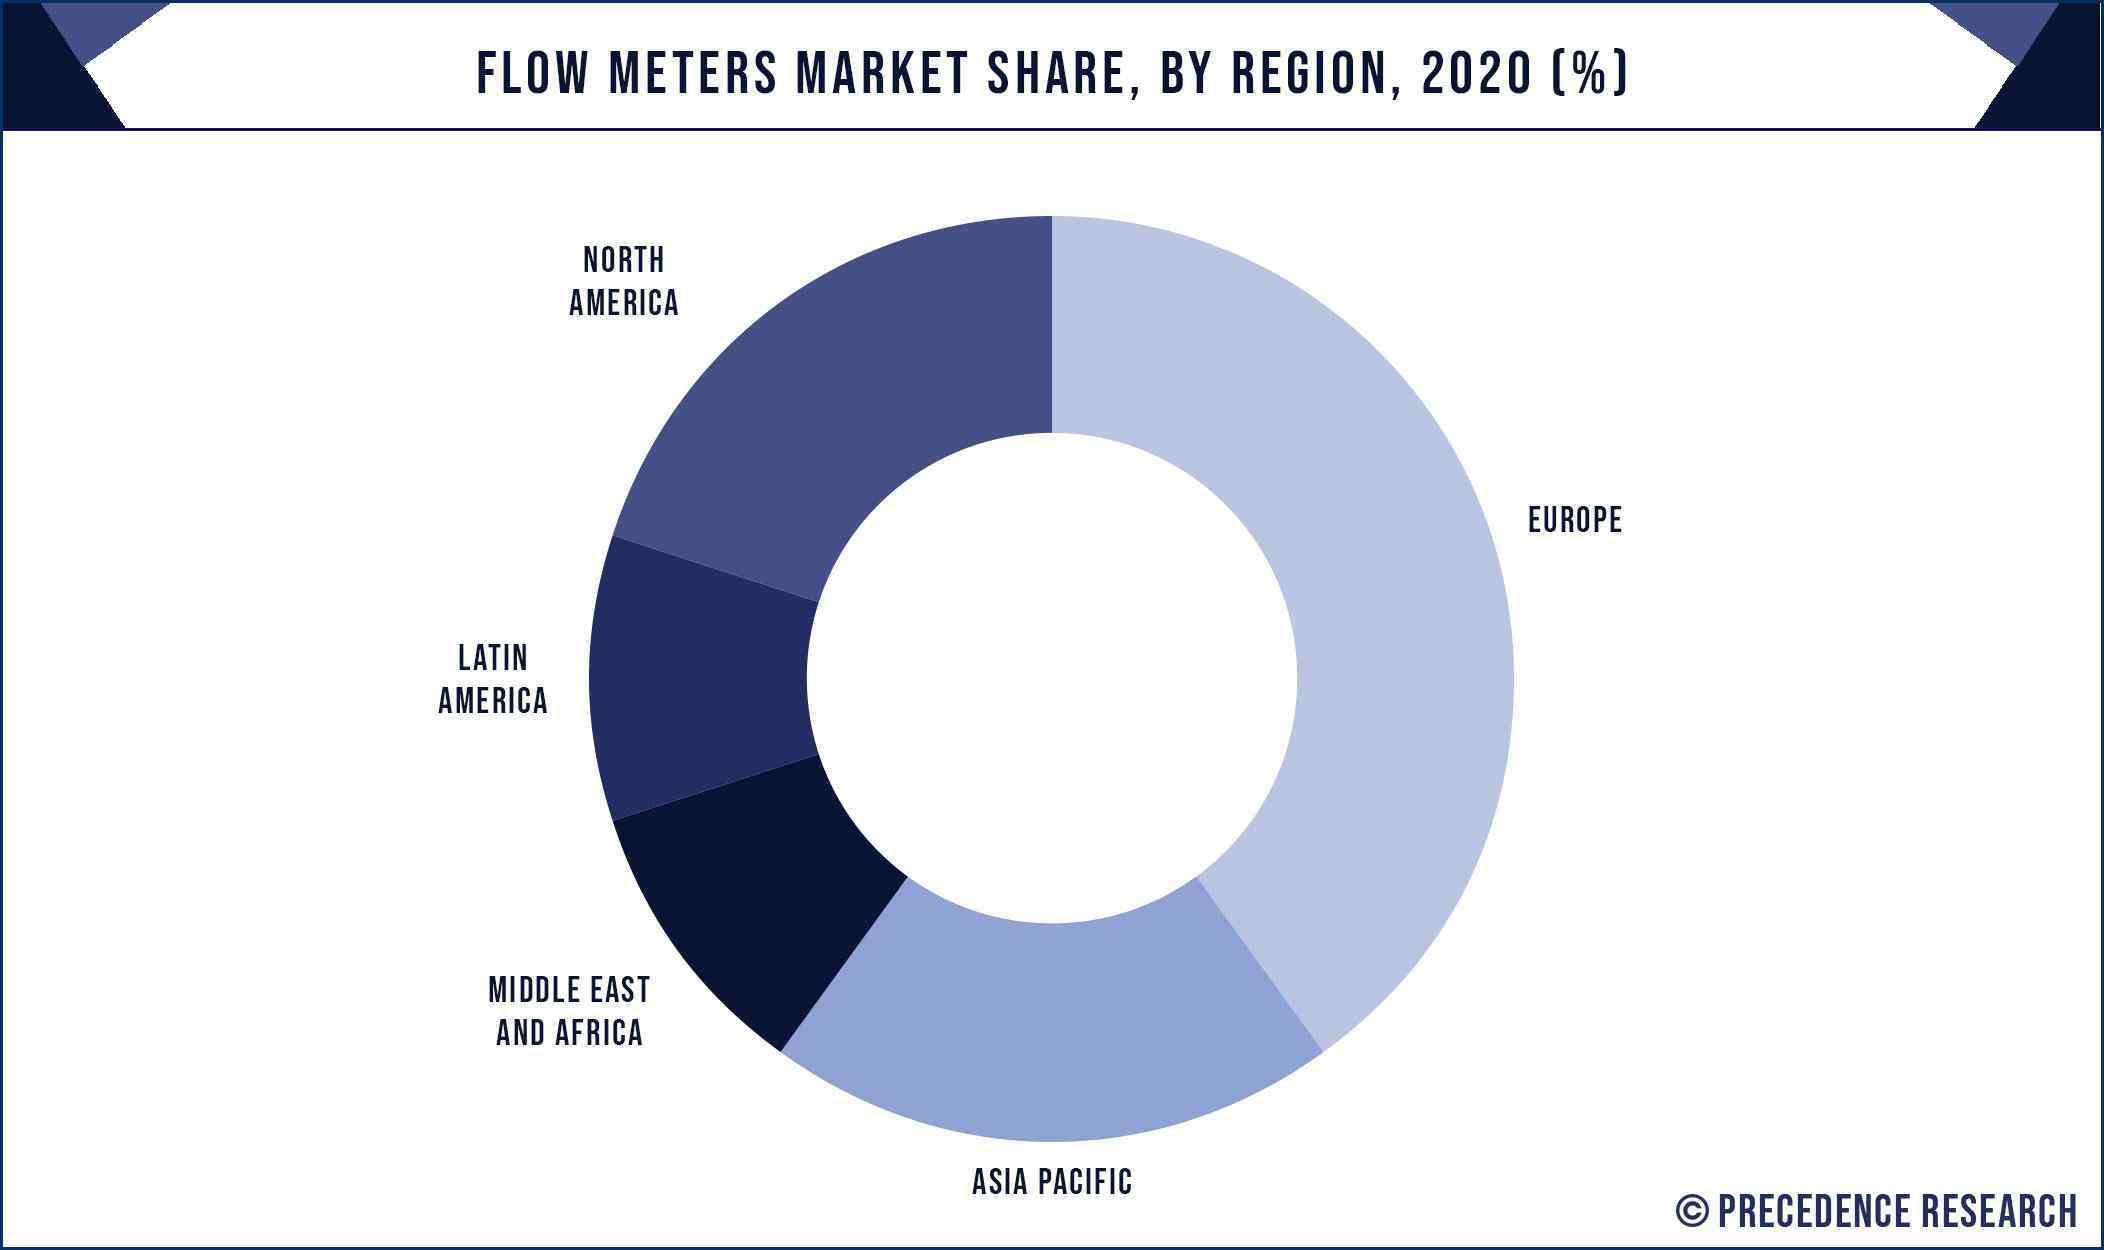 Flow Meters Market Share, By Region, 2020 (%)